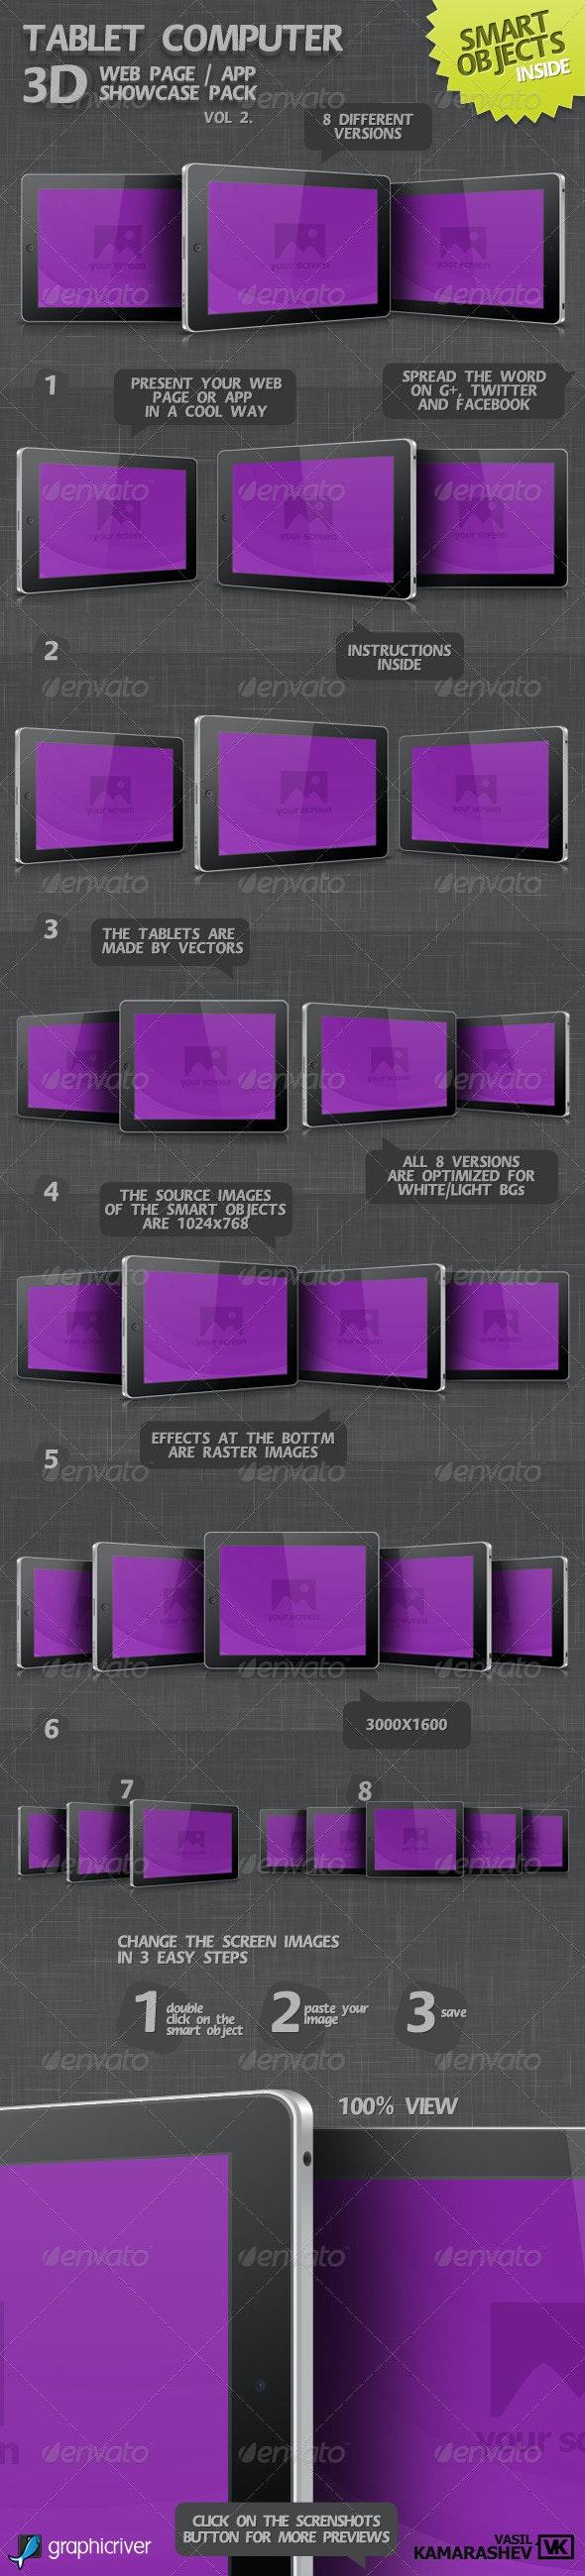 Tablet Computer 3D Web Page / App Showcase Vol.2 - Mobile Displays